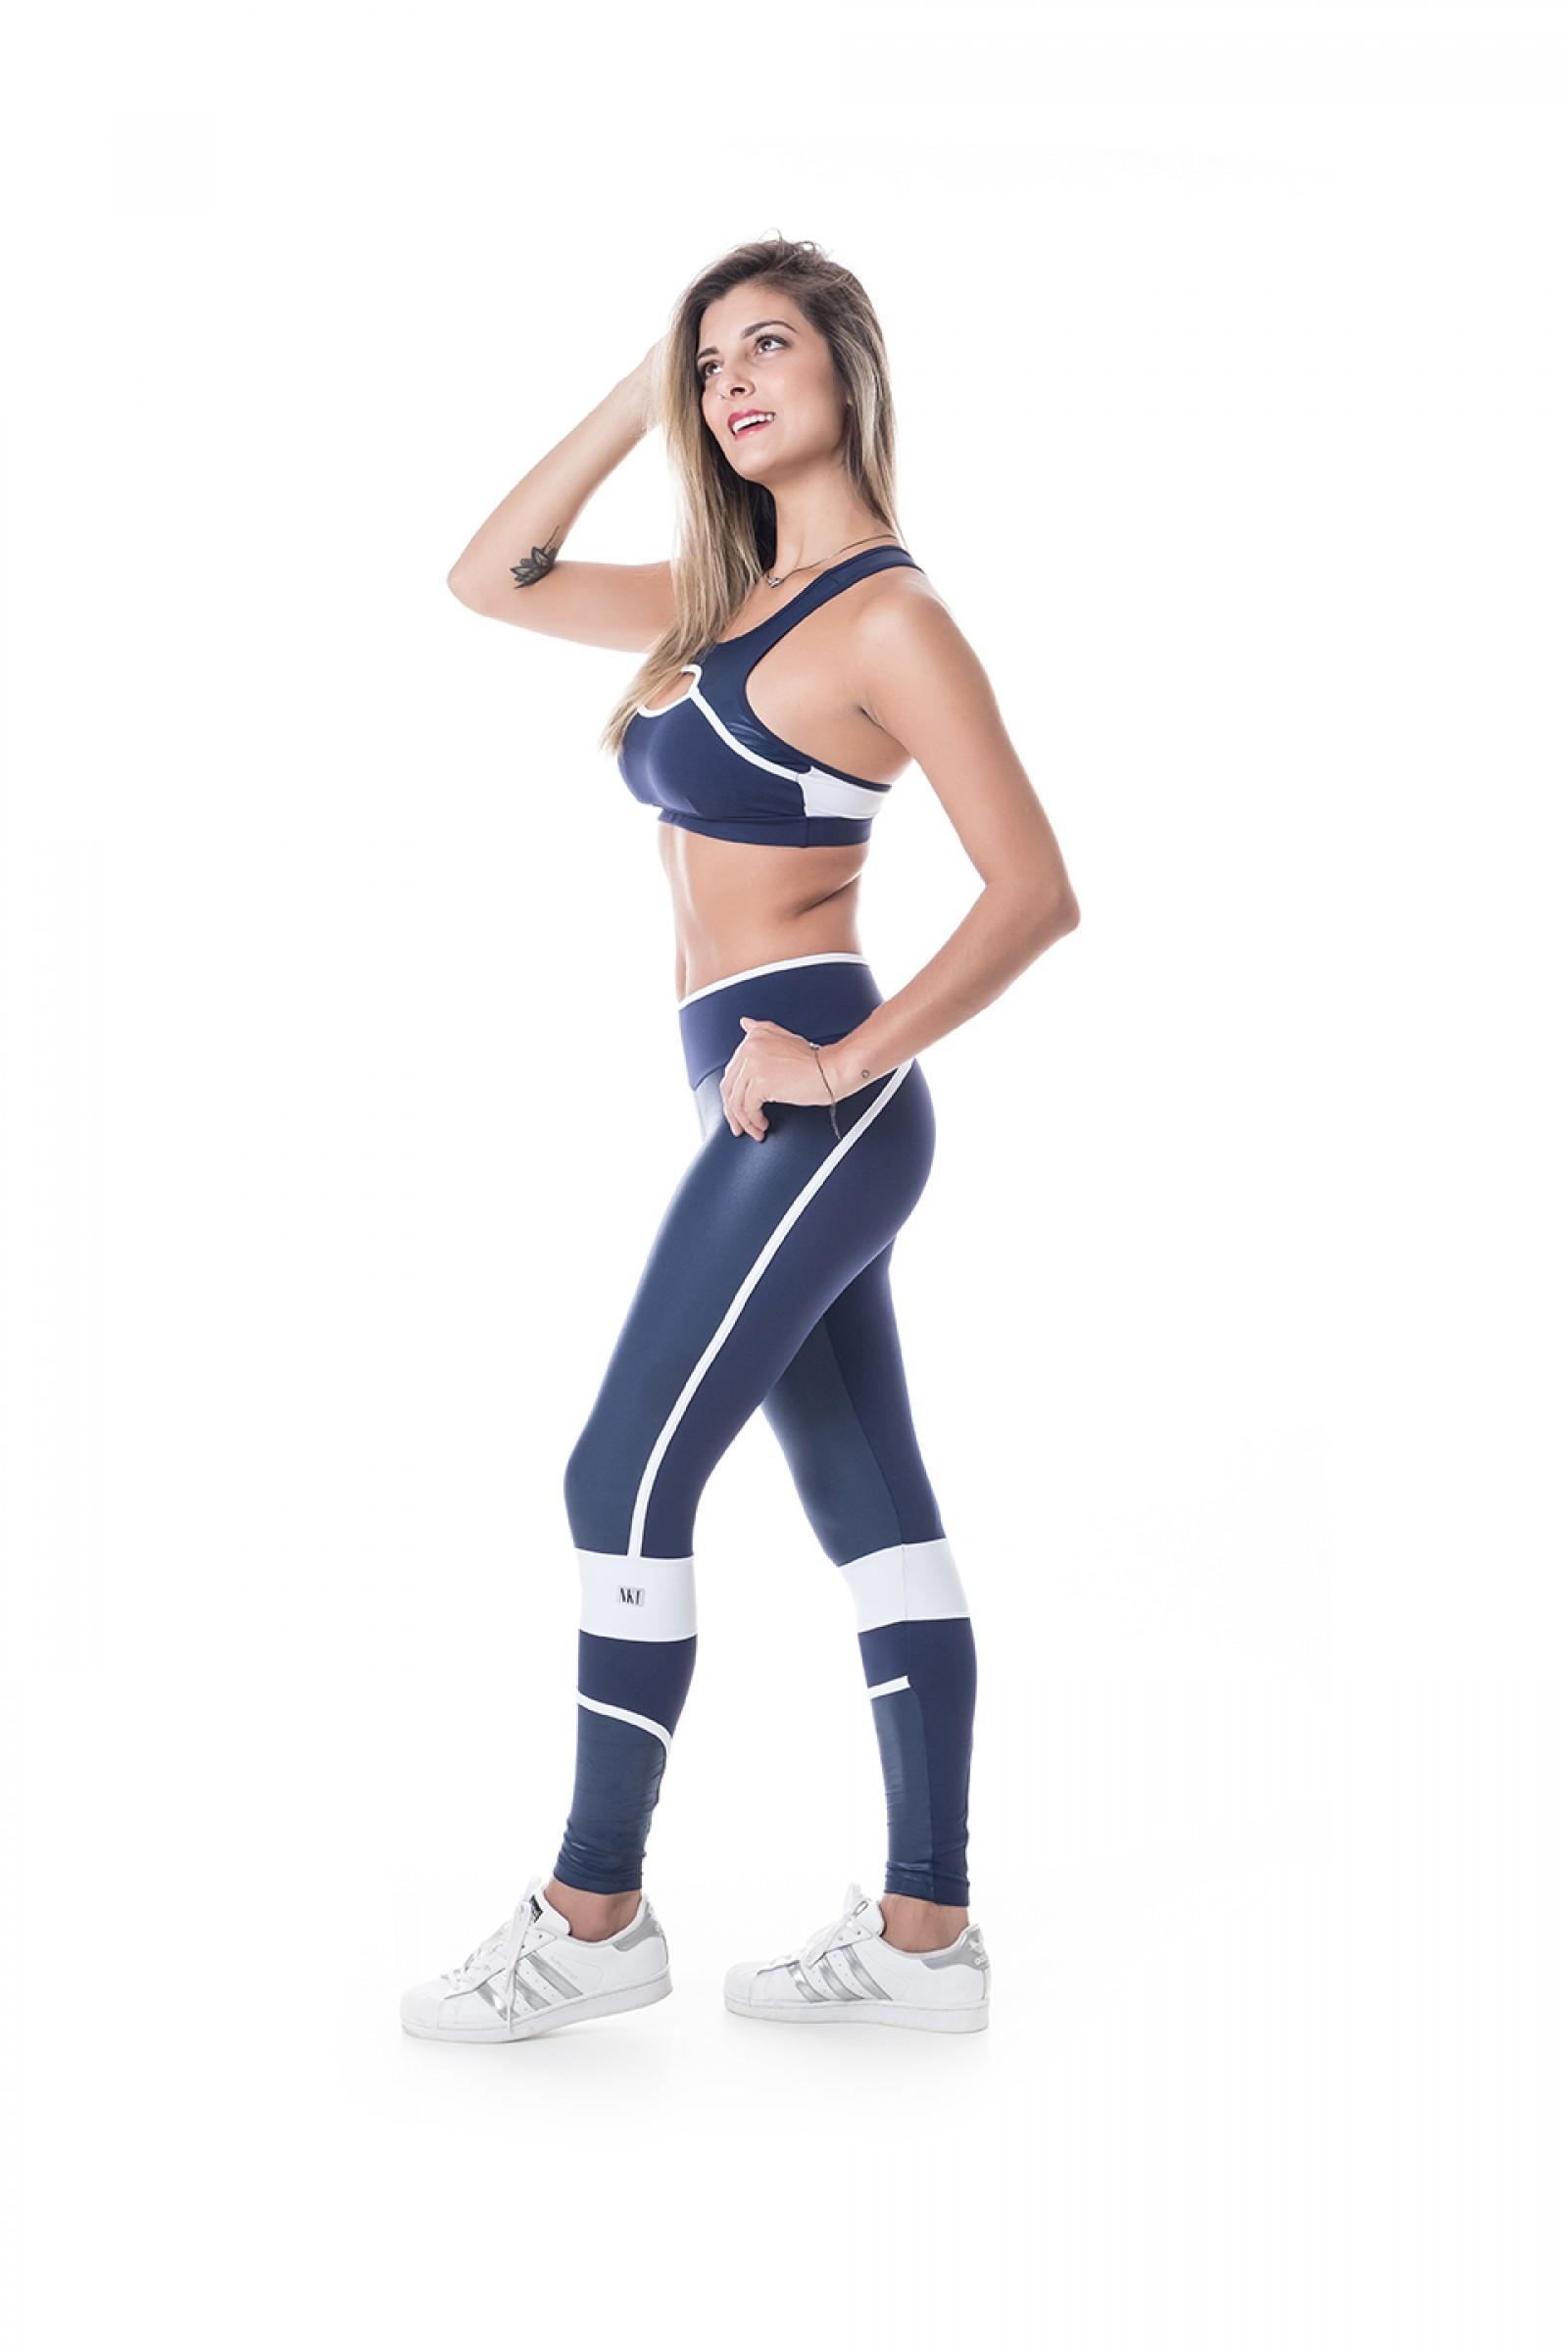 Legging Brave Marinho, Coleção Challenge - NKT Fitwear Moda Fitness